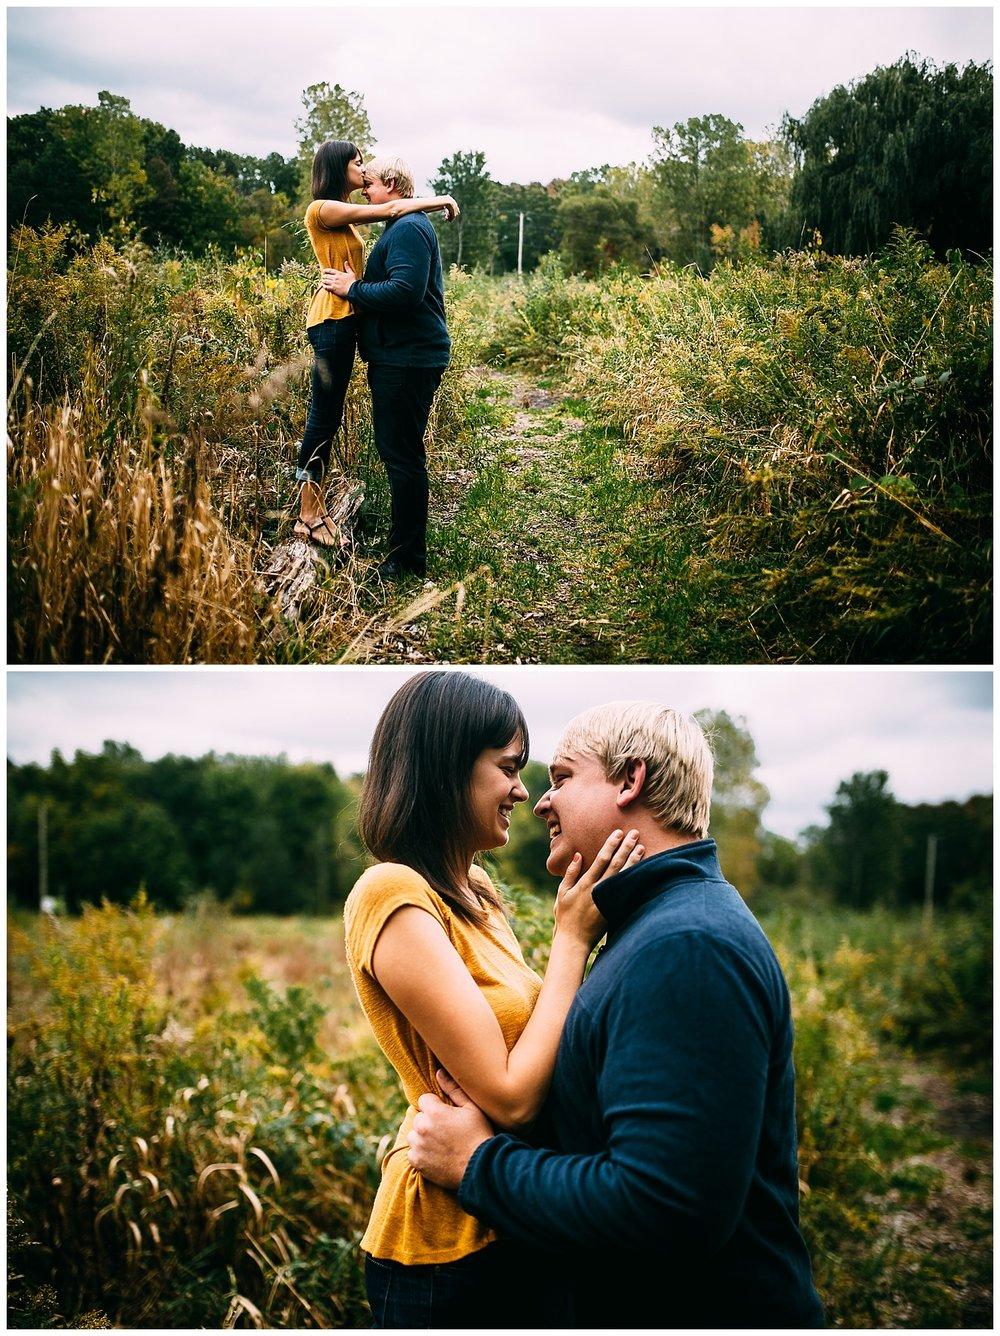 Marissa-Austin-Engaged-Michigan-Wedding-Photographer-8360.jpg